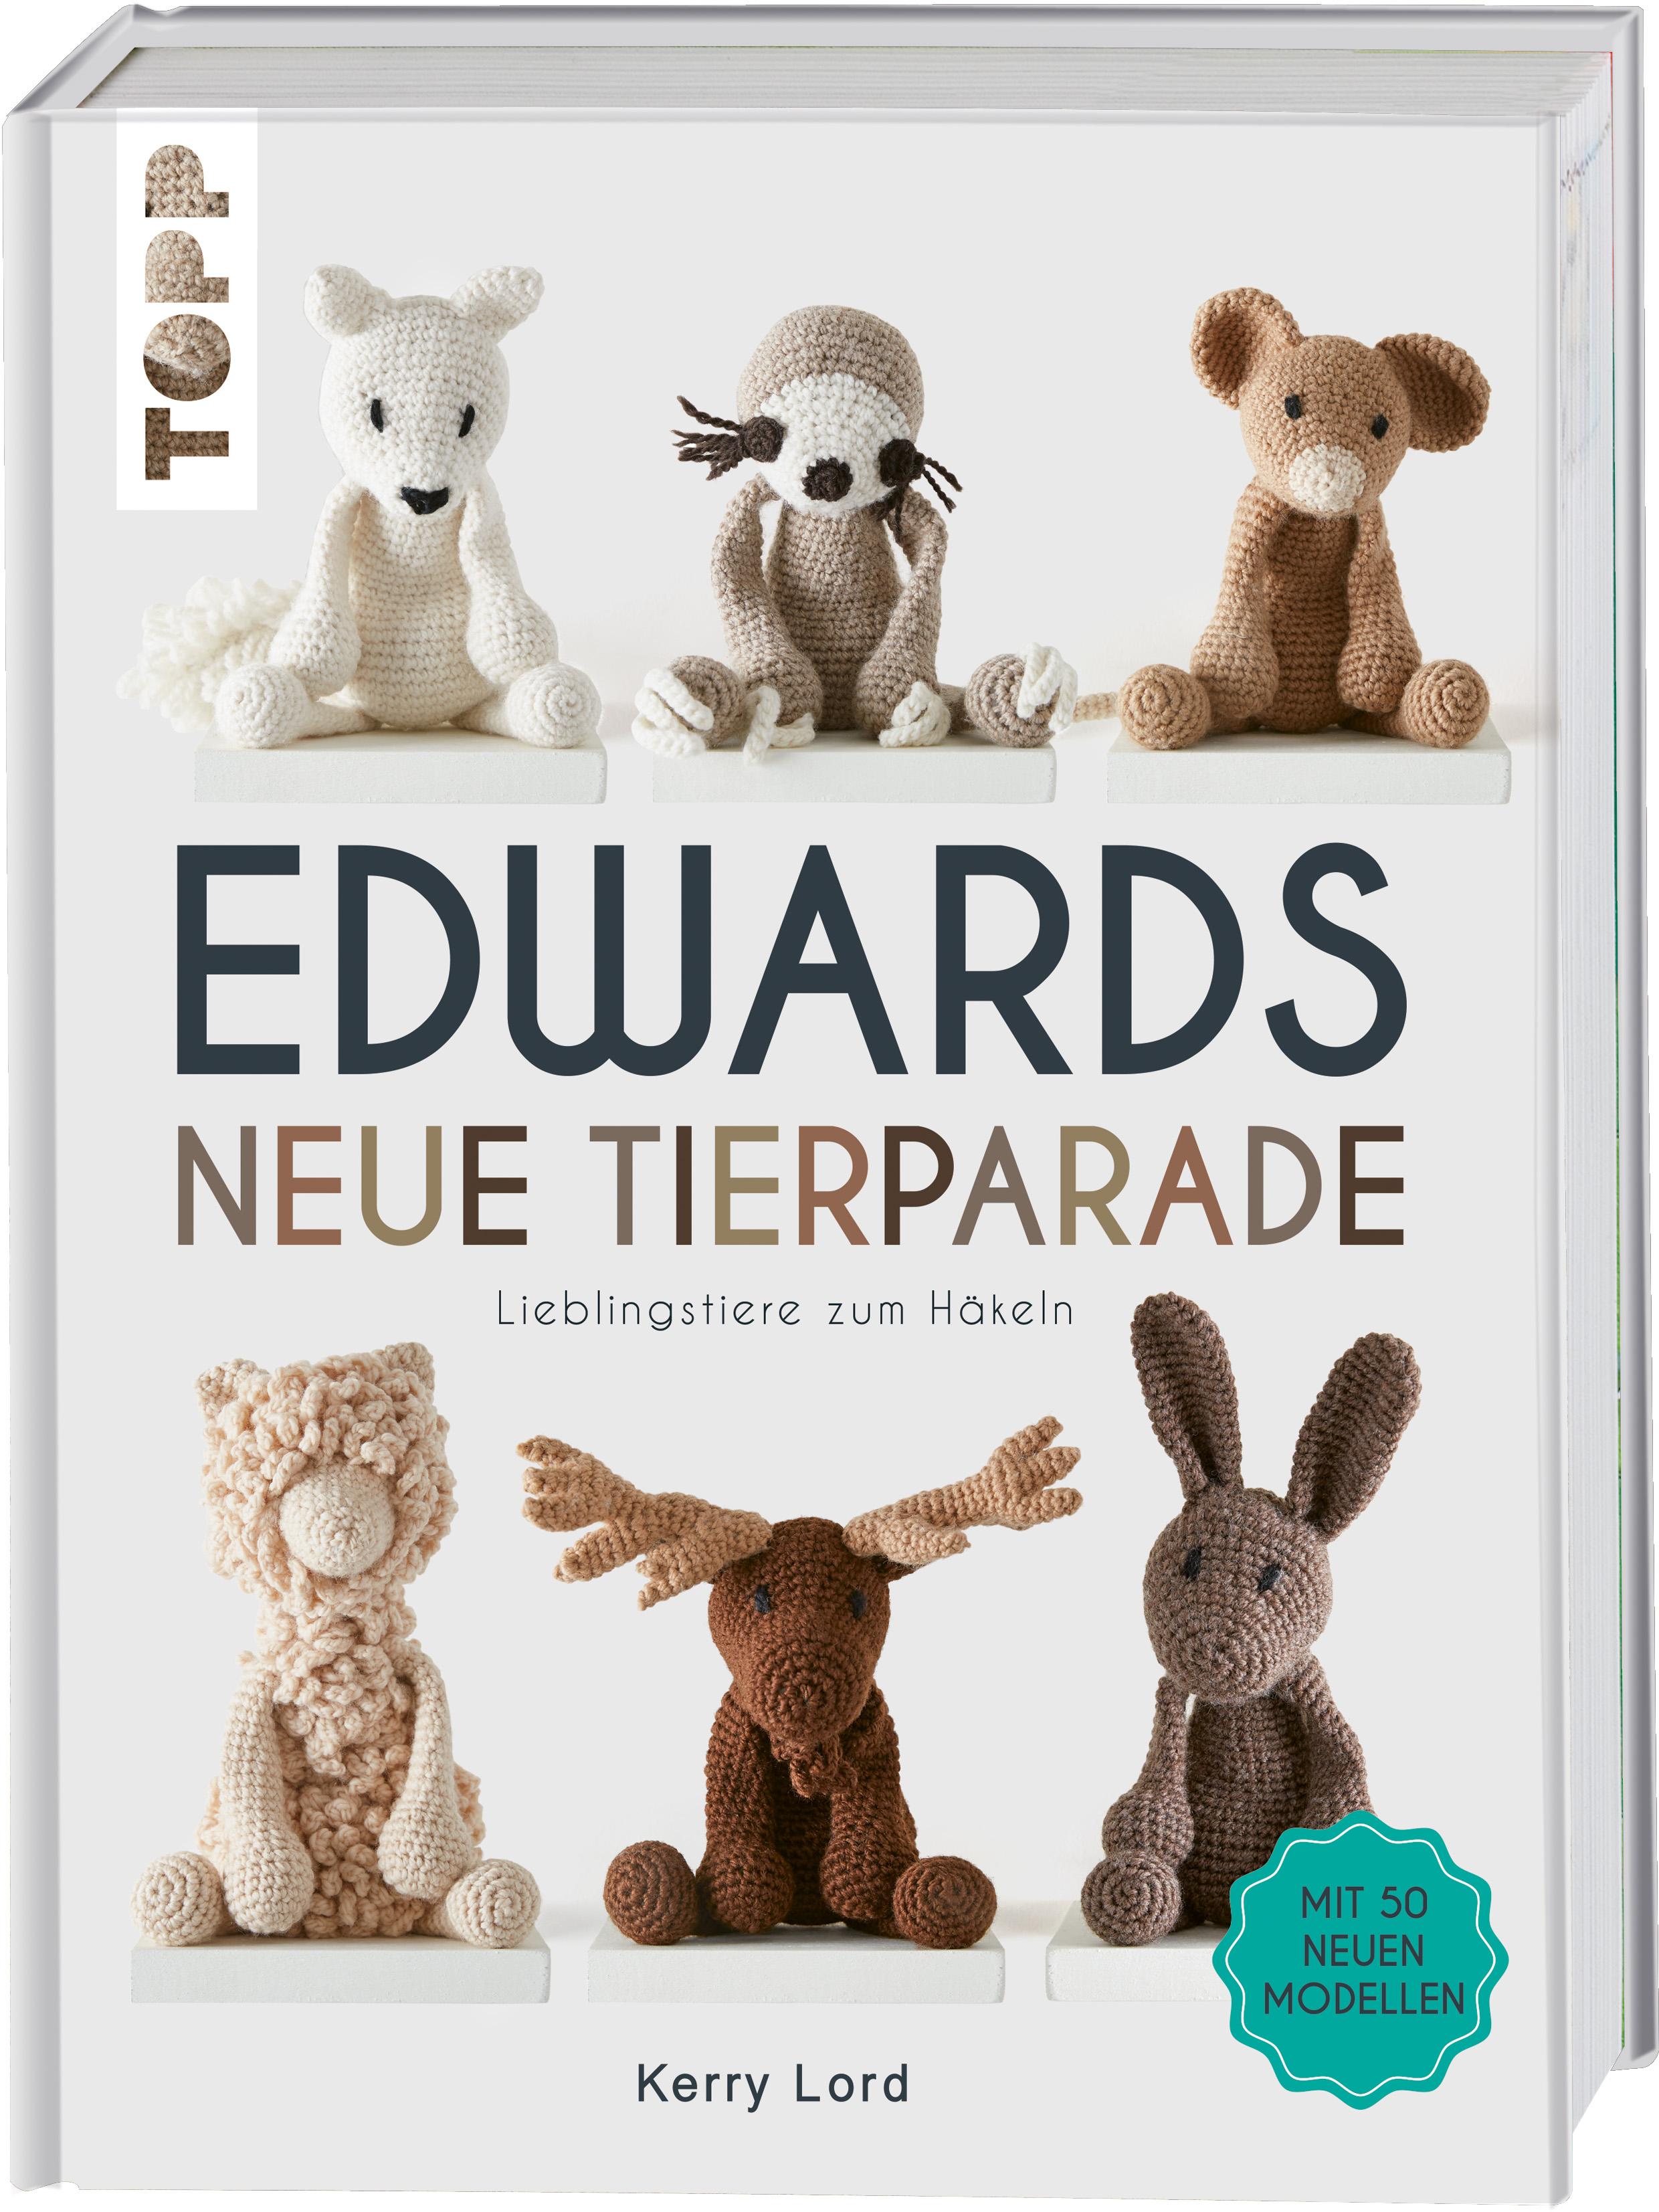 Edwards neue Tierparade (Kerry Lord)